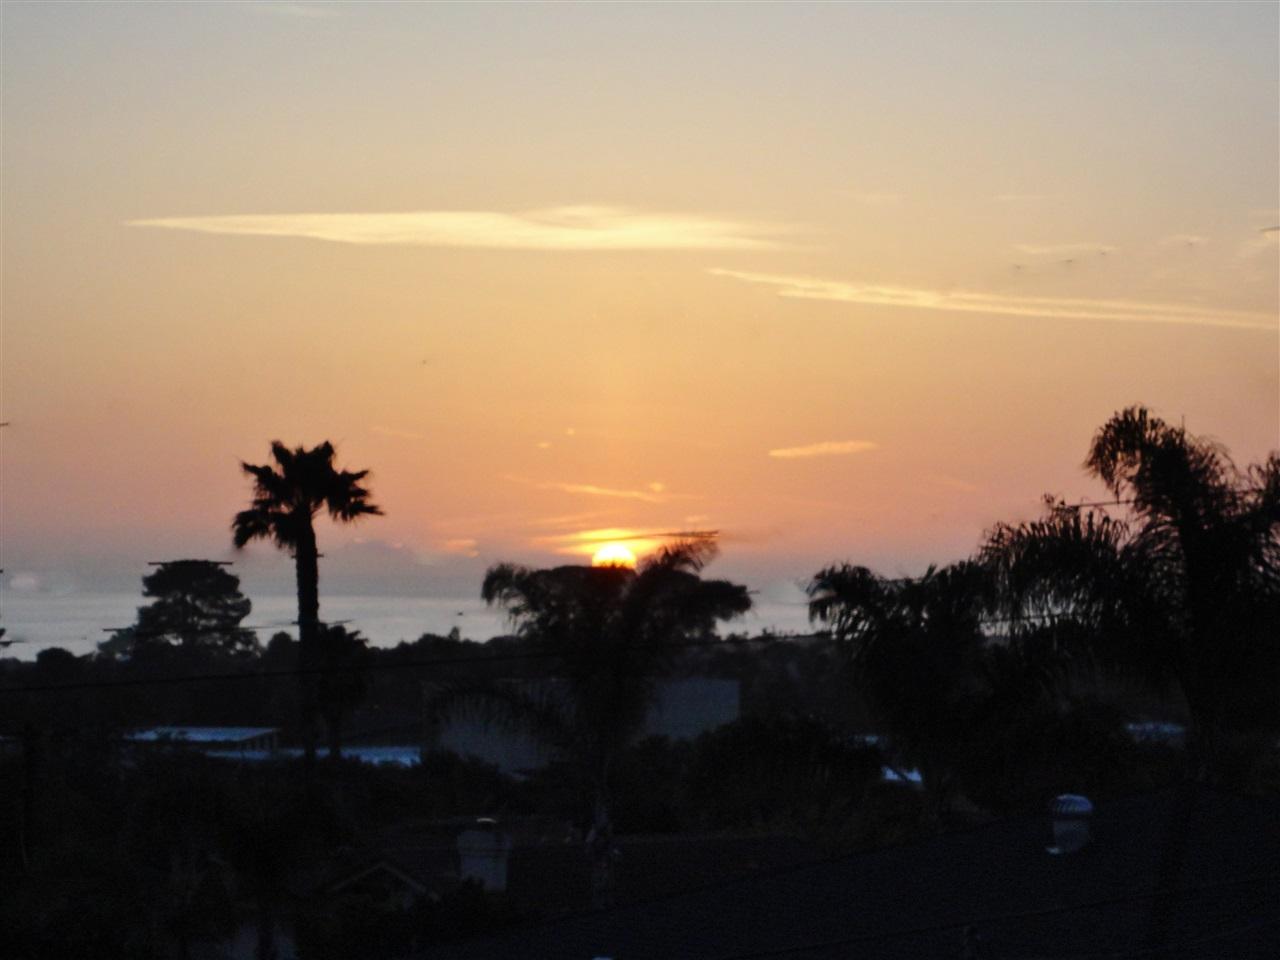 3601 Seaview Way, Carlsbad, CA 92008